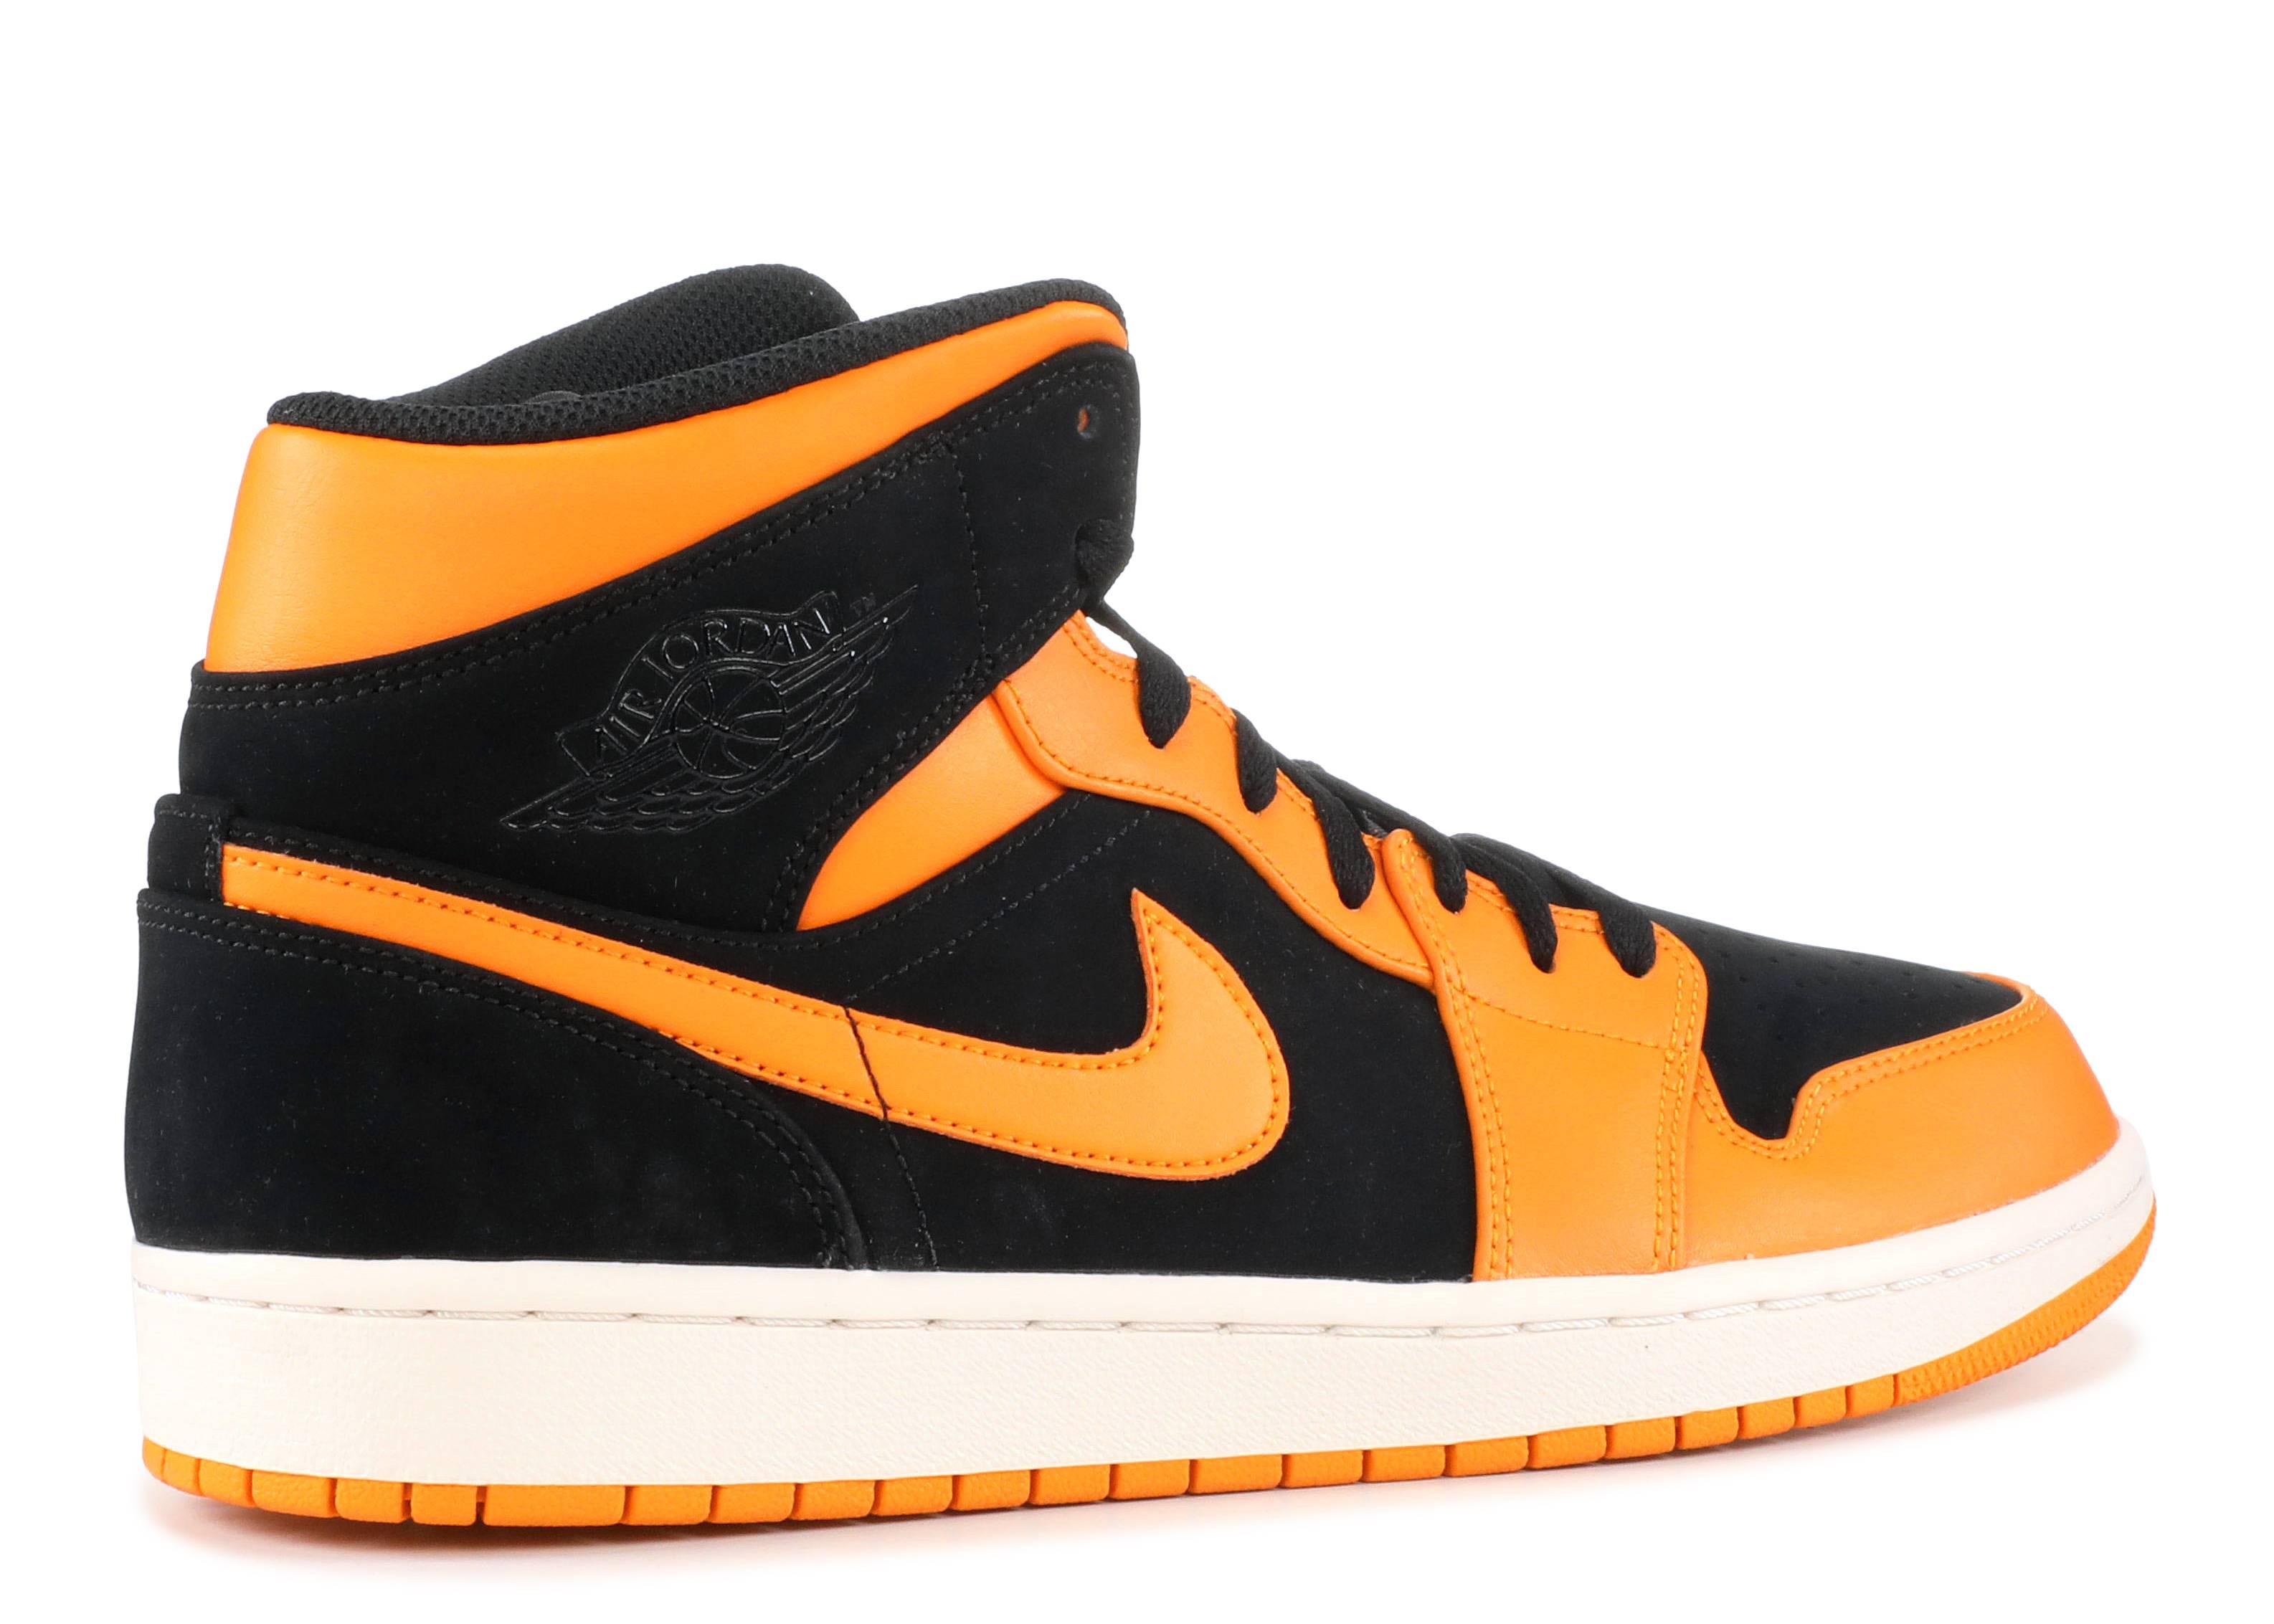 cac66b95af29 Air Jordan 1 Mid - Nike - 554724 081 - black orange peel-sail ...